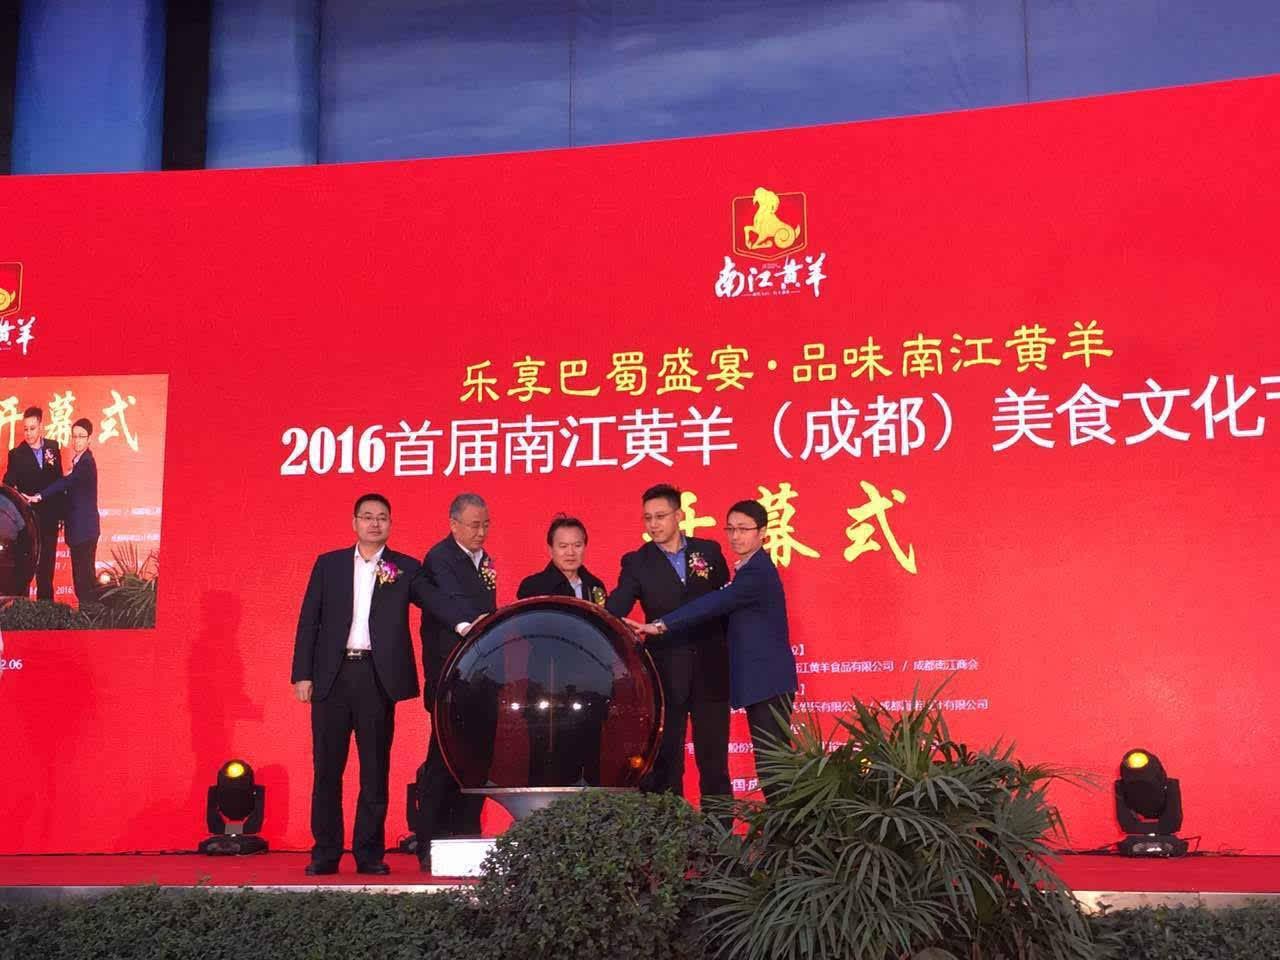 <font color='rgb(0,0,0)'>2016首届南江黄羊美食文化节在成都举行</font>